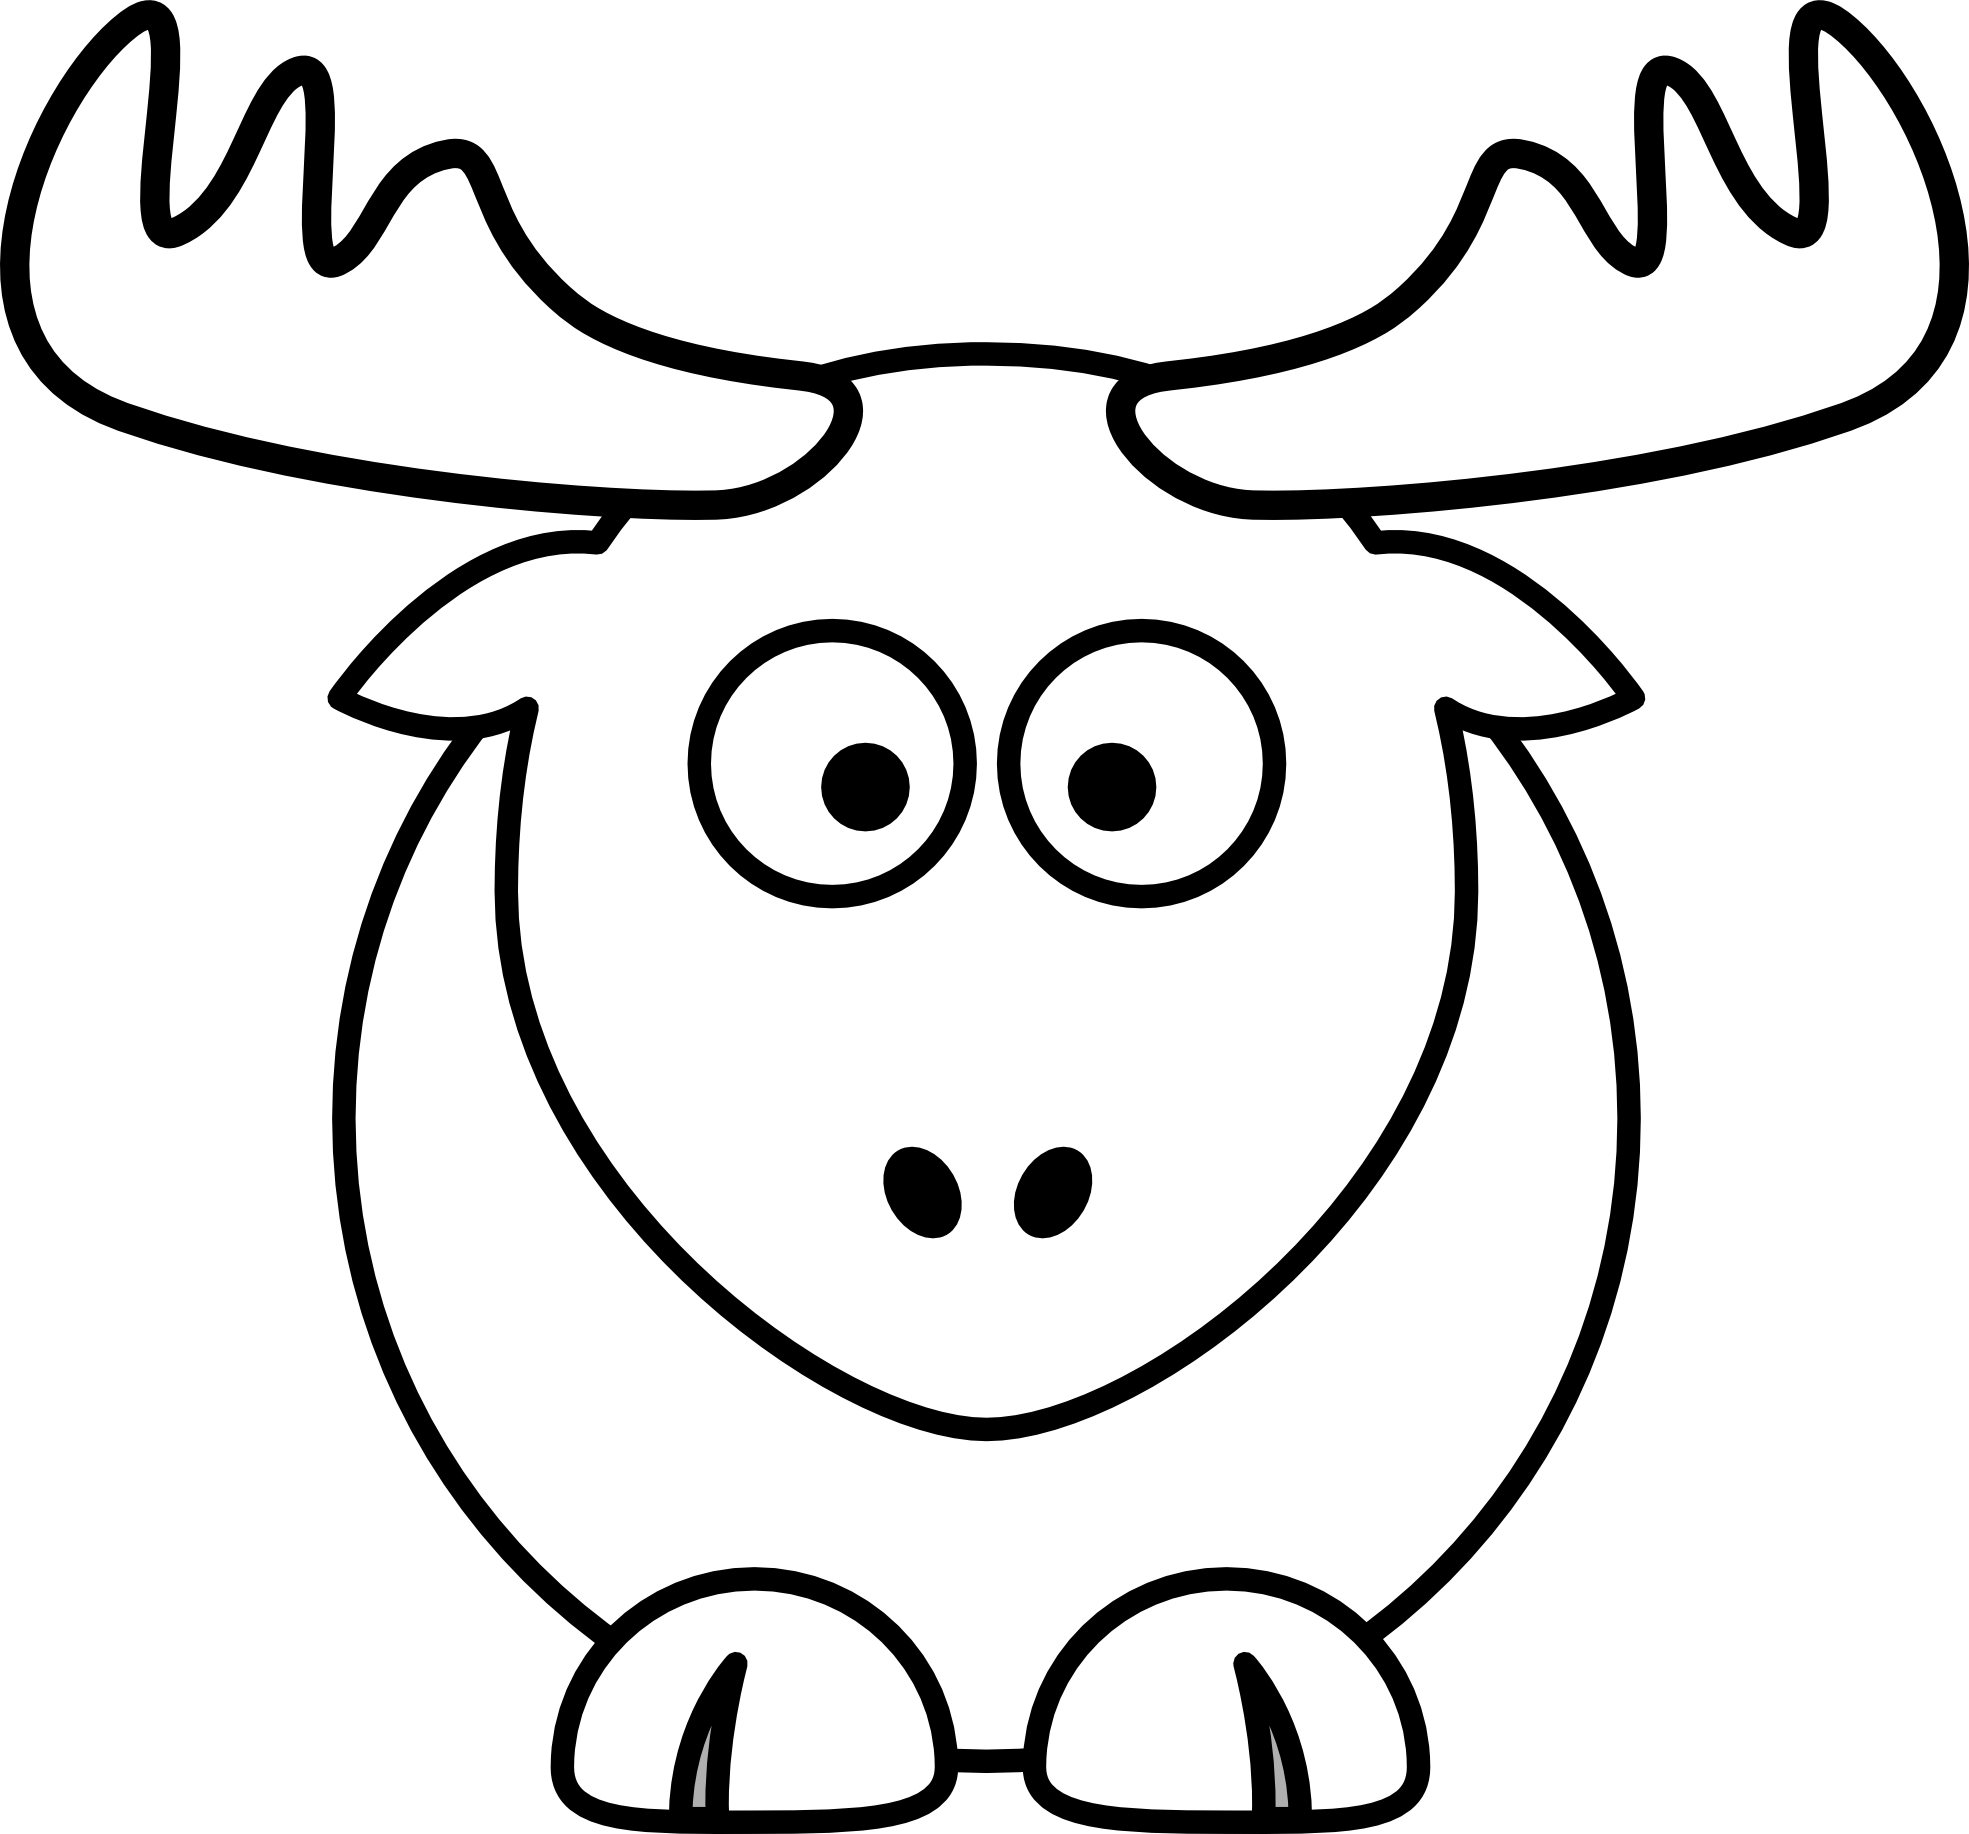 . PlusPng.com Reindeer Raindeer Elk Black White Line Animal 1969px.png 193(K) - Elk PNG Black And White